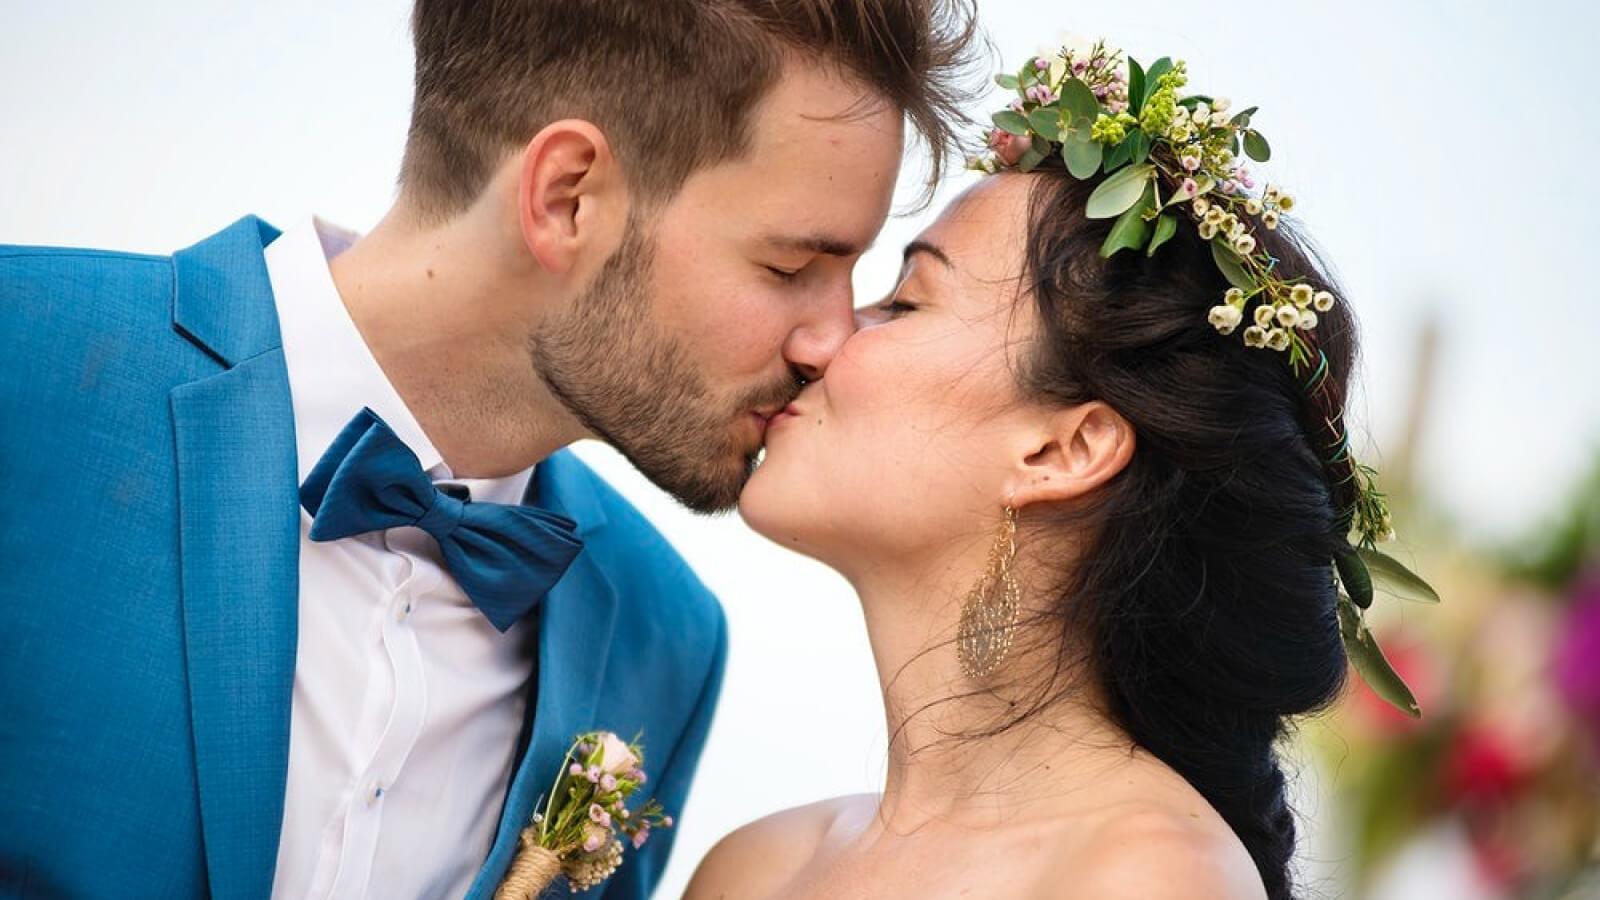 Les mariés s'embrassent dans les Alpes-Maritimes